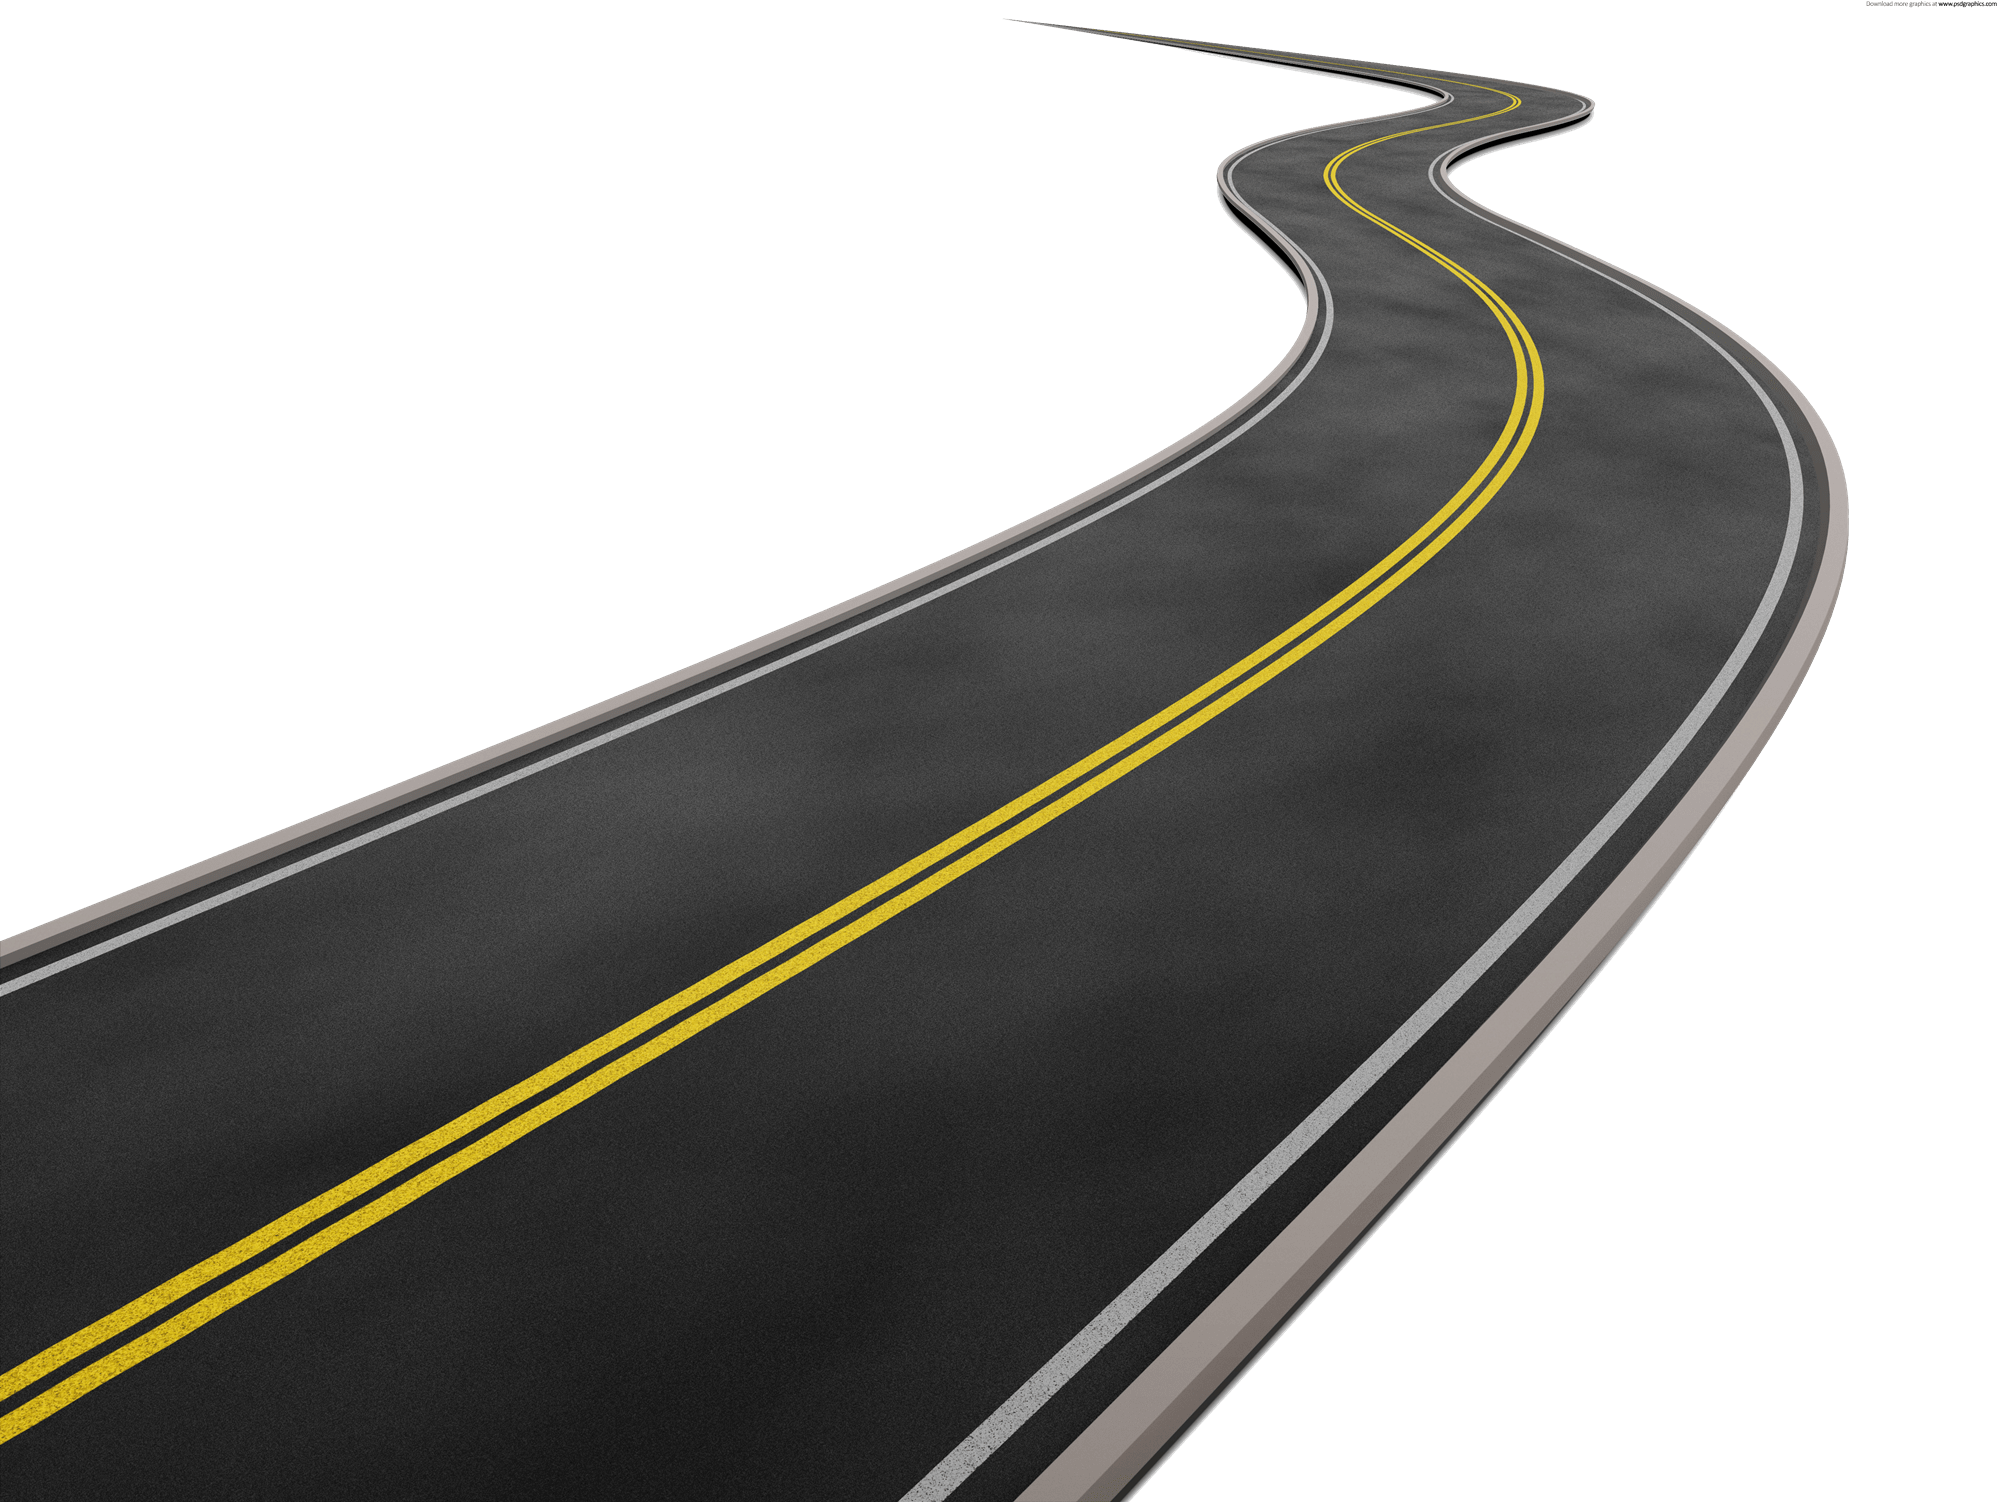 Clipart road transparent background. Traffic lights png stickpng